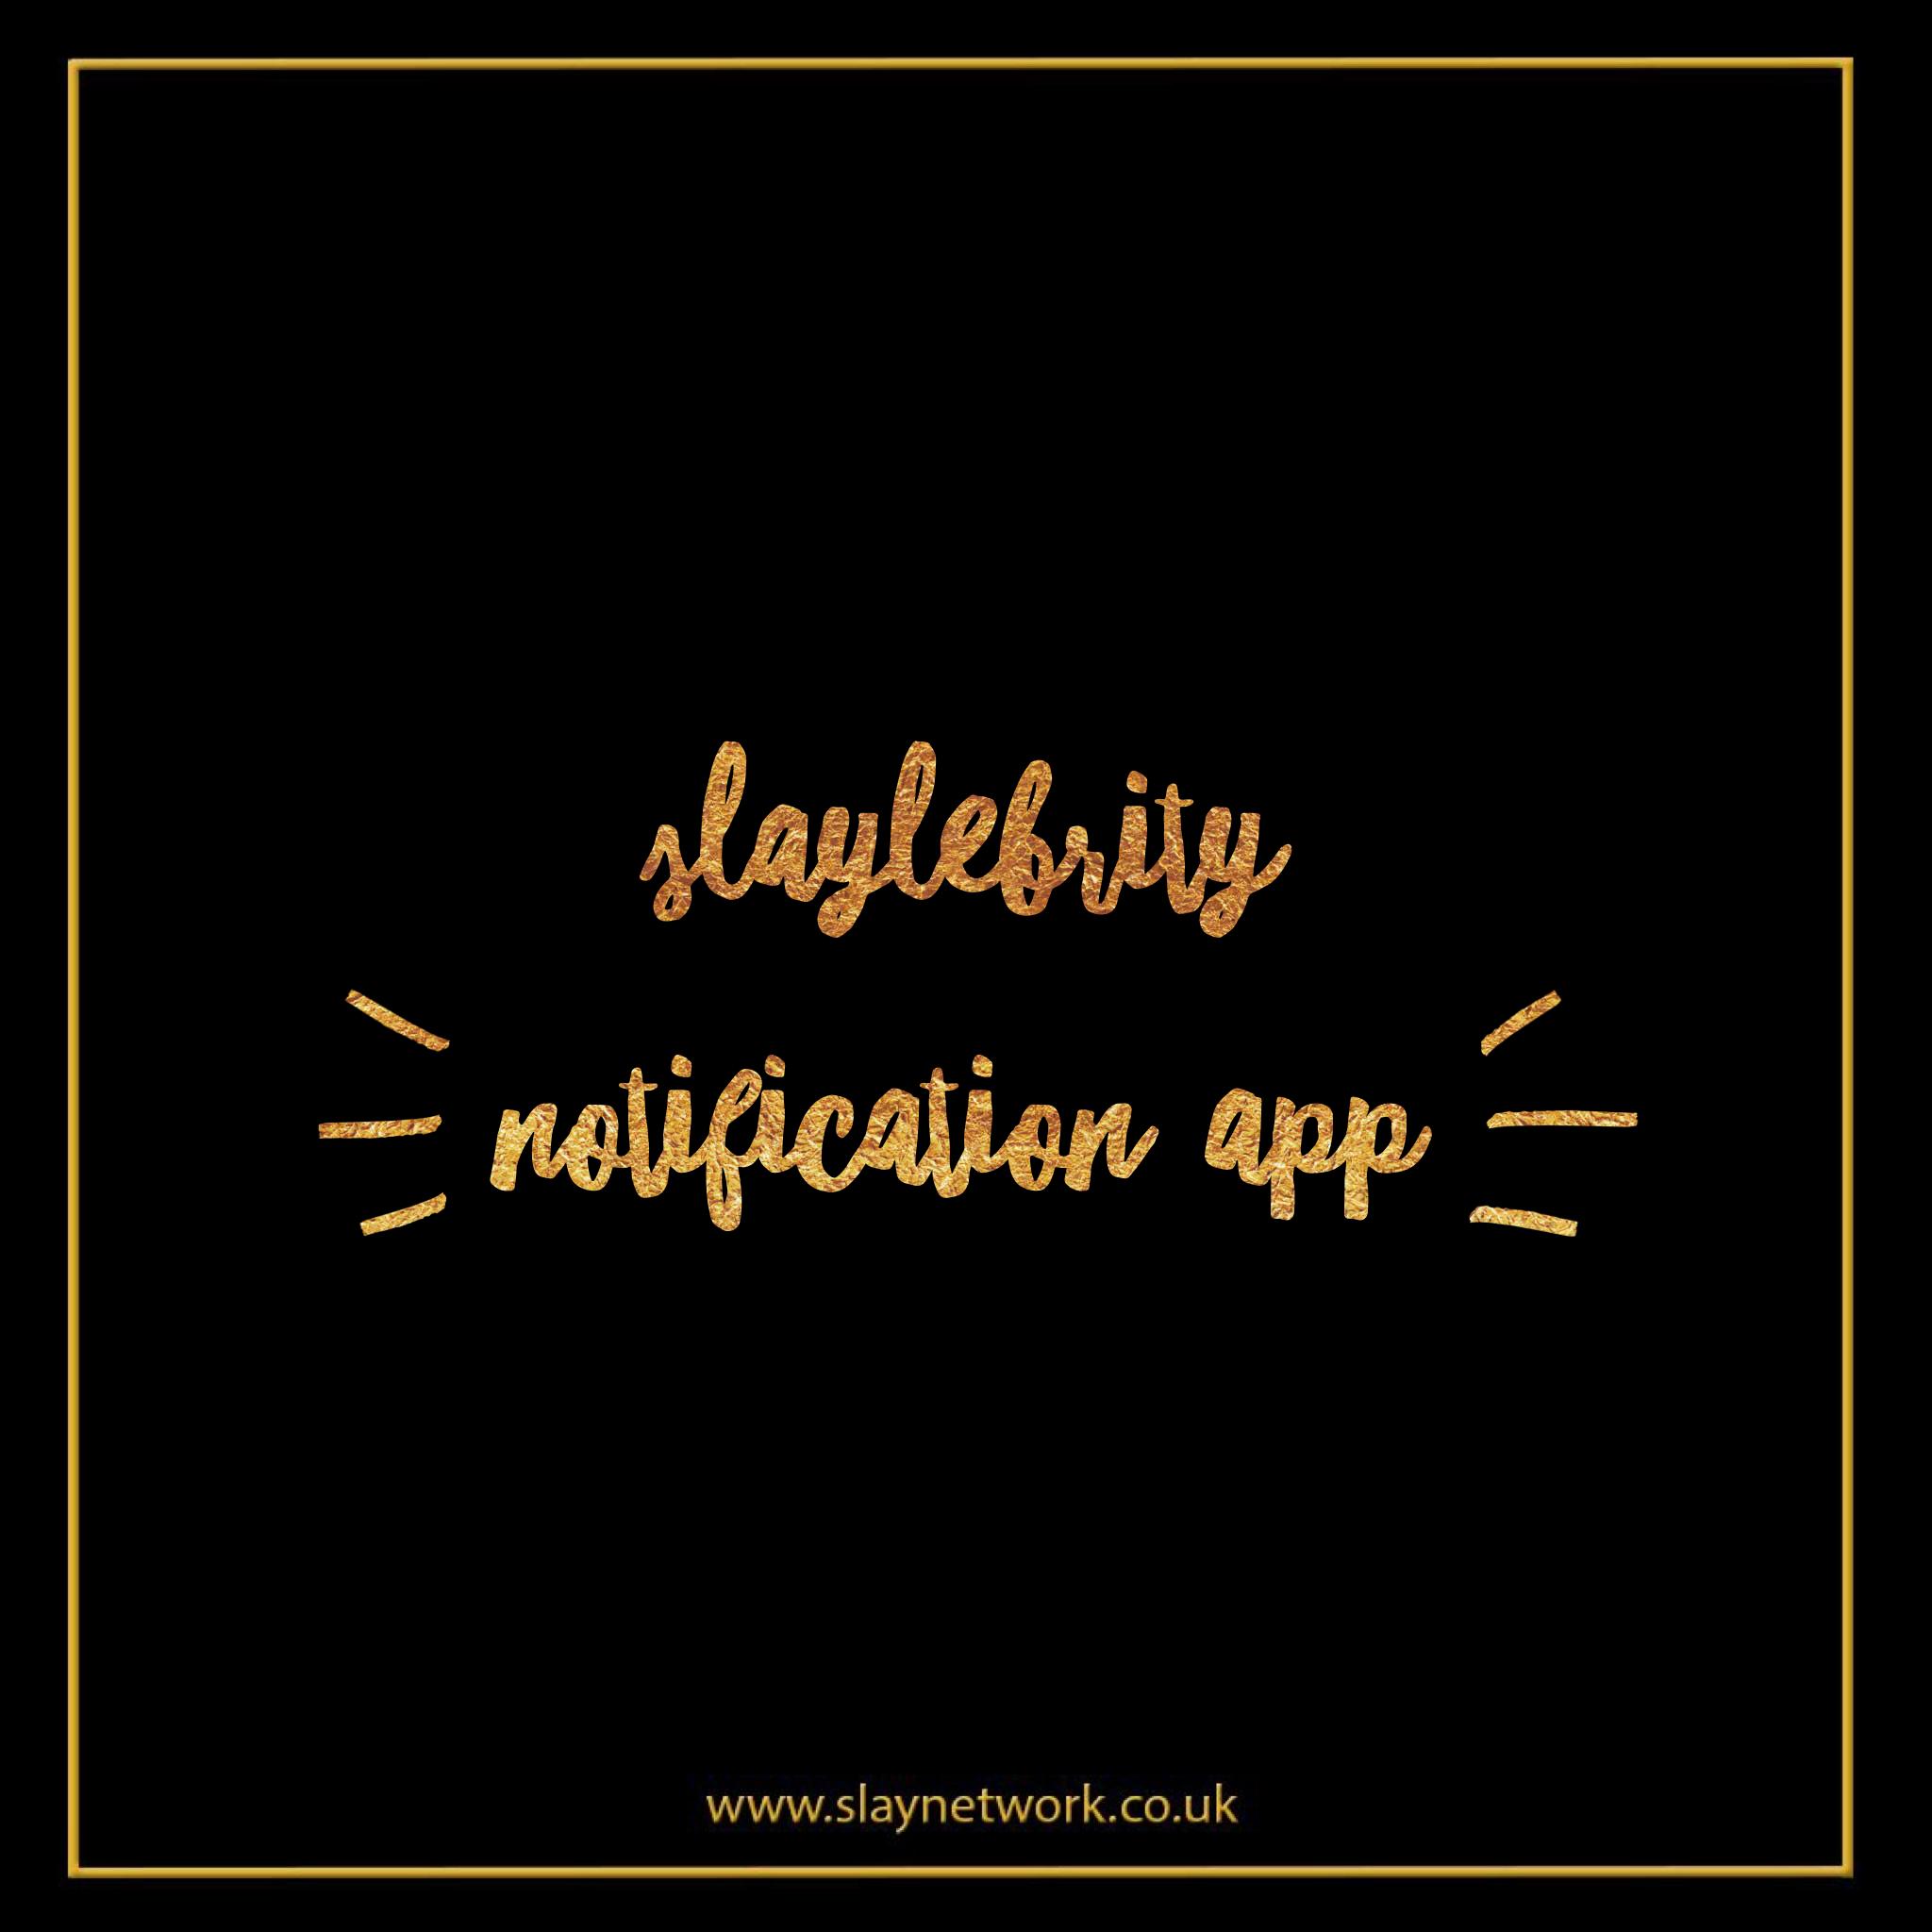 slaylebrity notification app